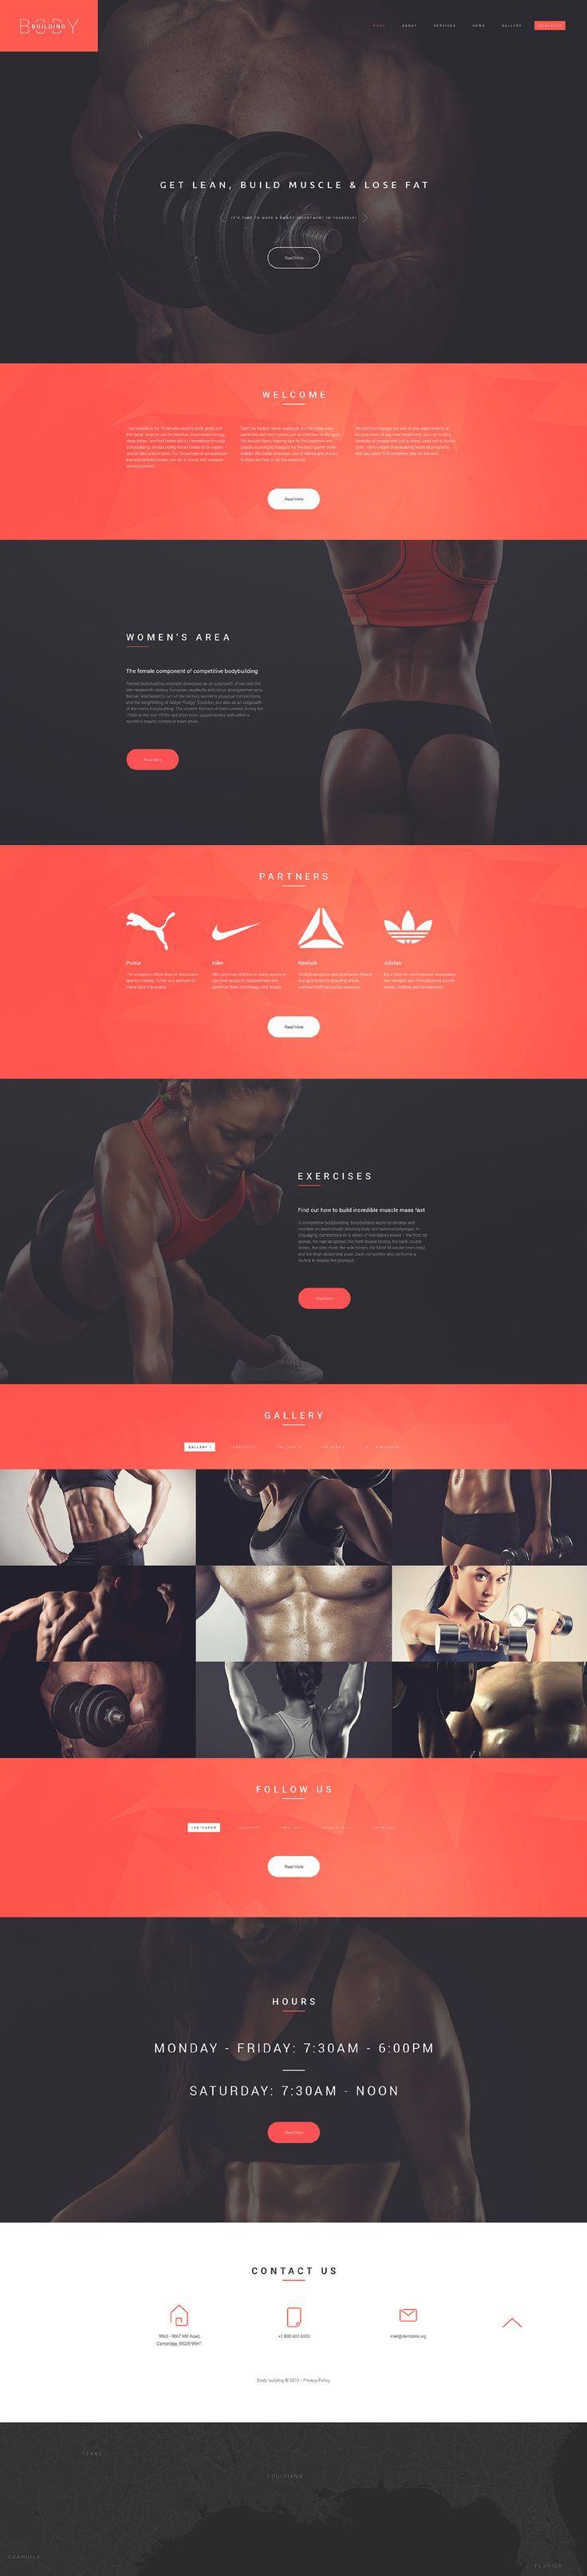 Bodybuilders' Club Website Template  http://www.templatemonster.com/website-templates/55451.html?utm_source=pinterest&utm_medium=timeline&utm_campaign=55451